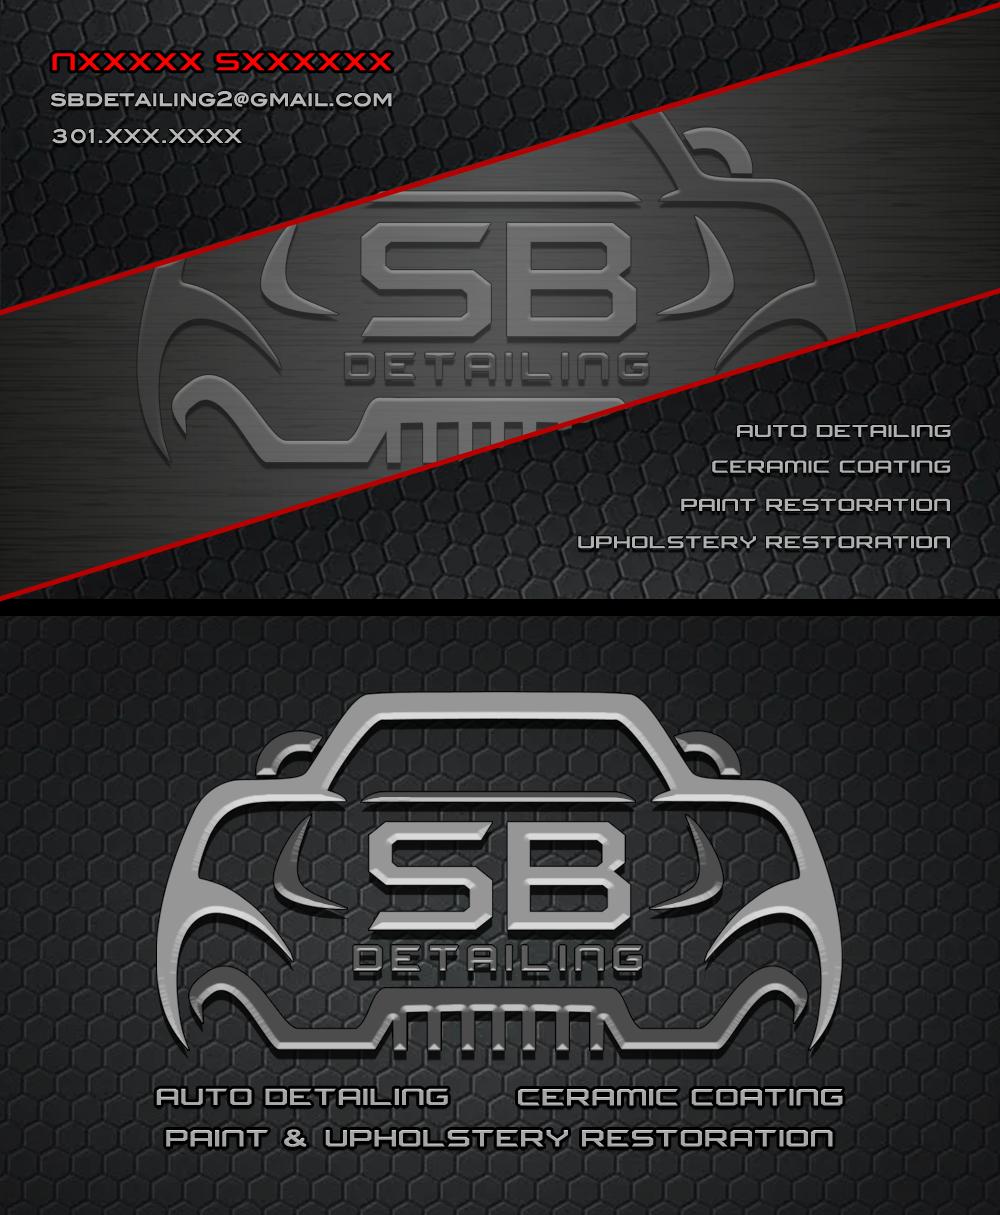 SBD_CARD_SAMPLE